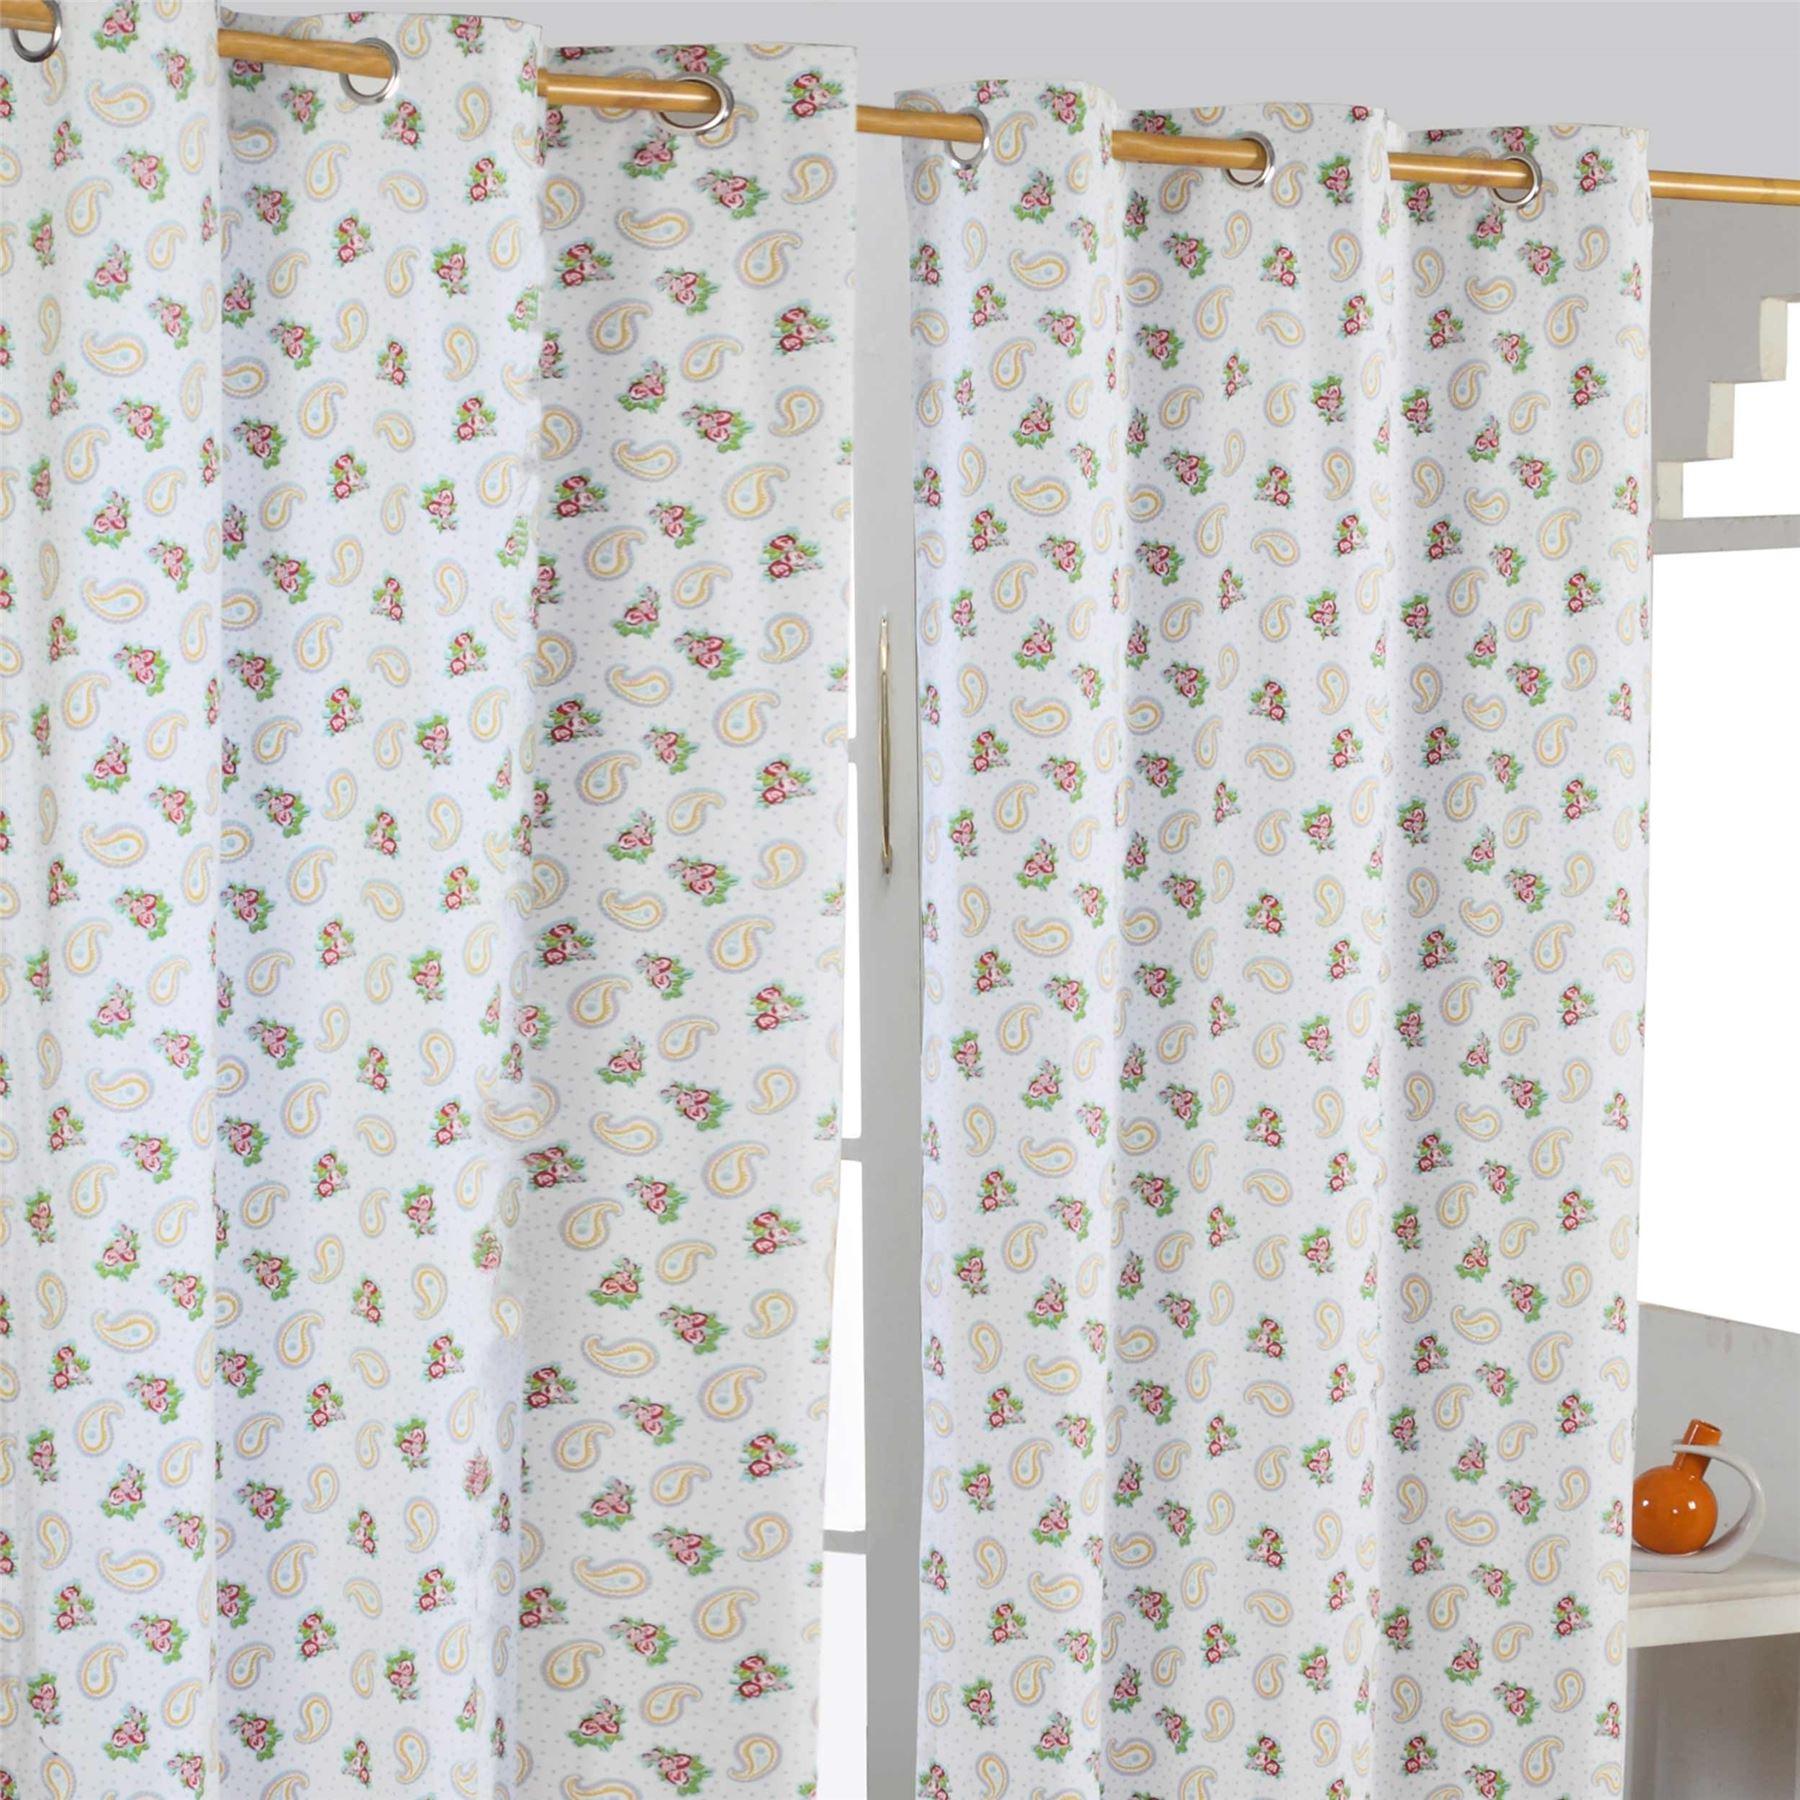 curtain girls curtains merge home room p designer floral window decoration designs sweet